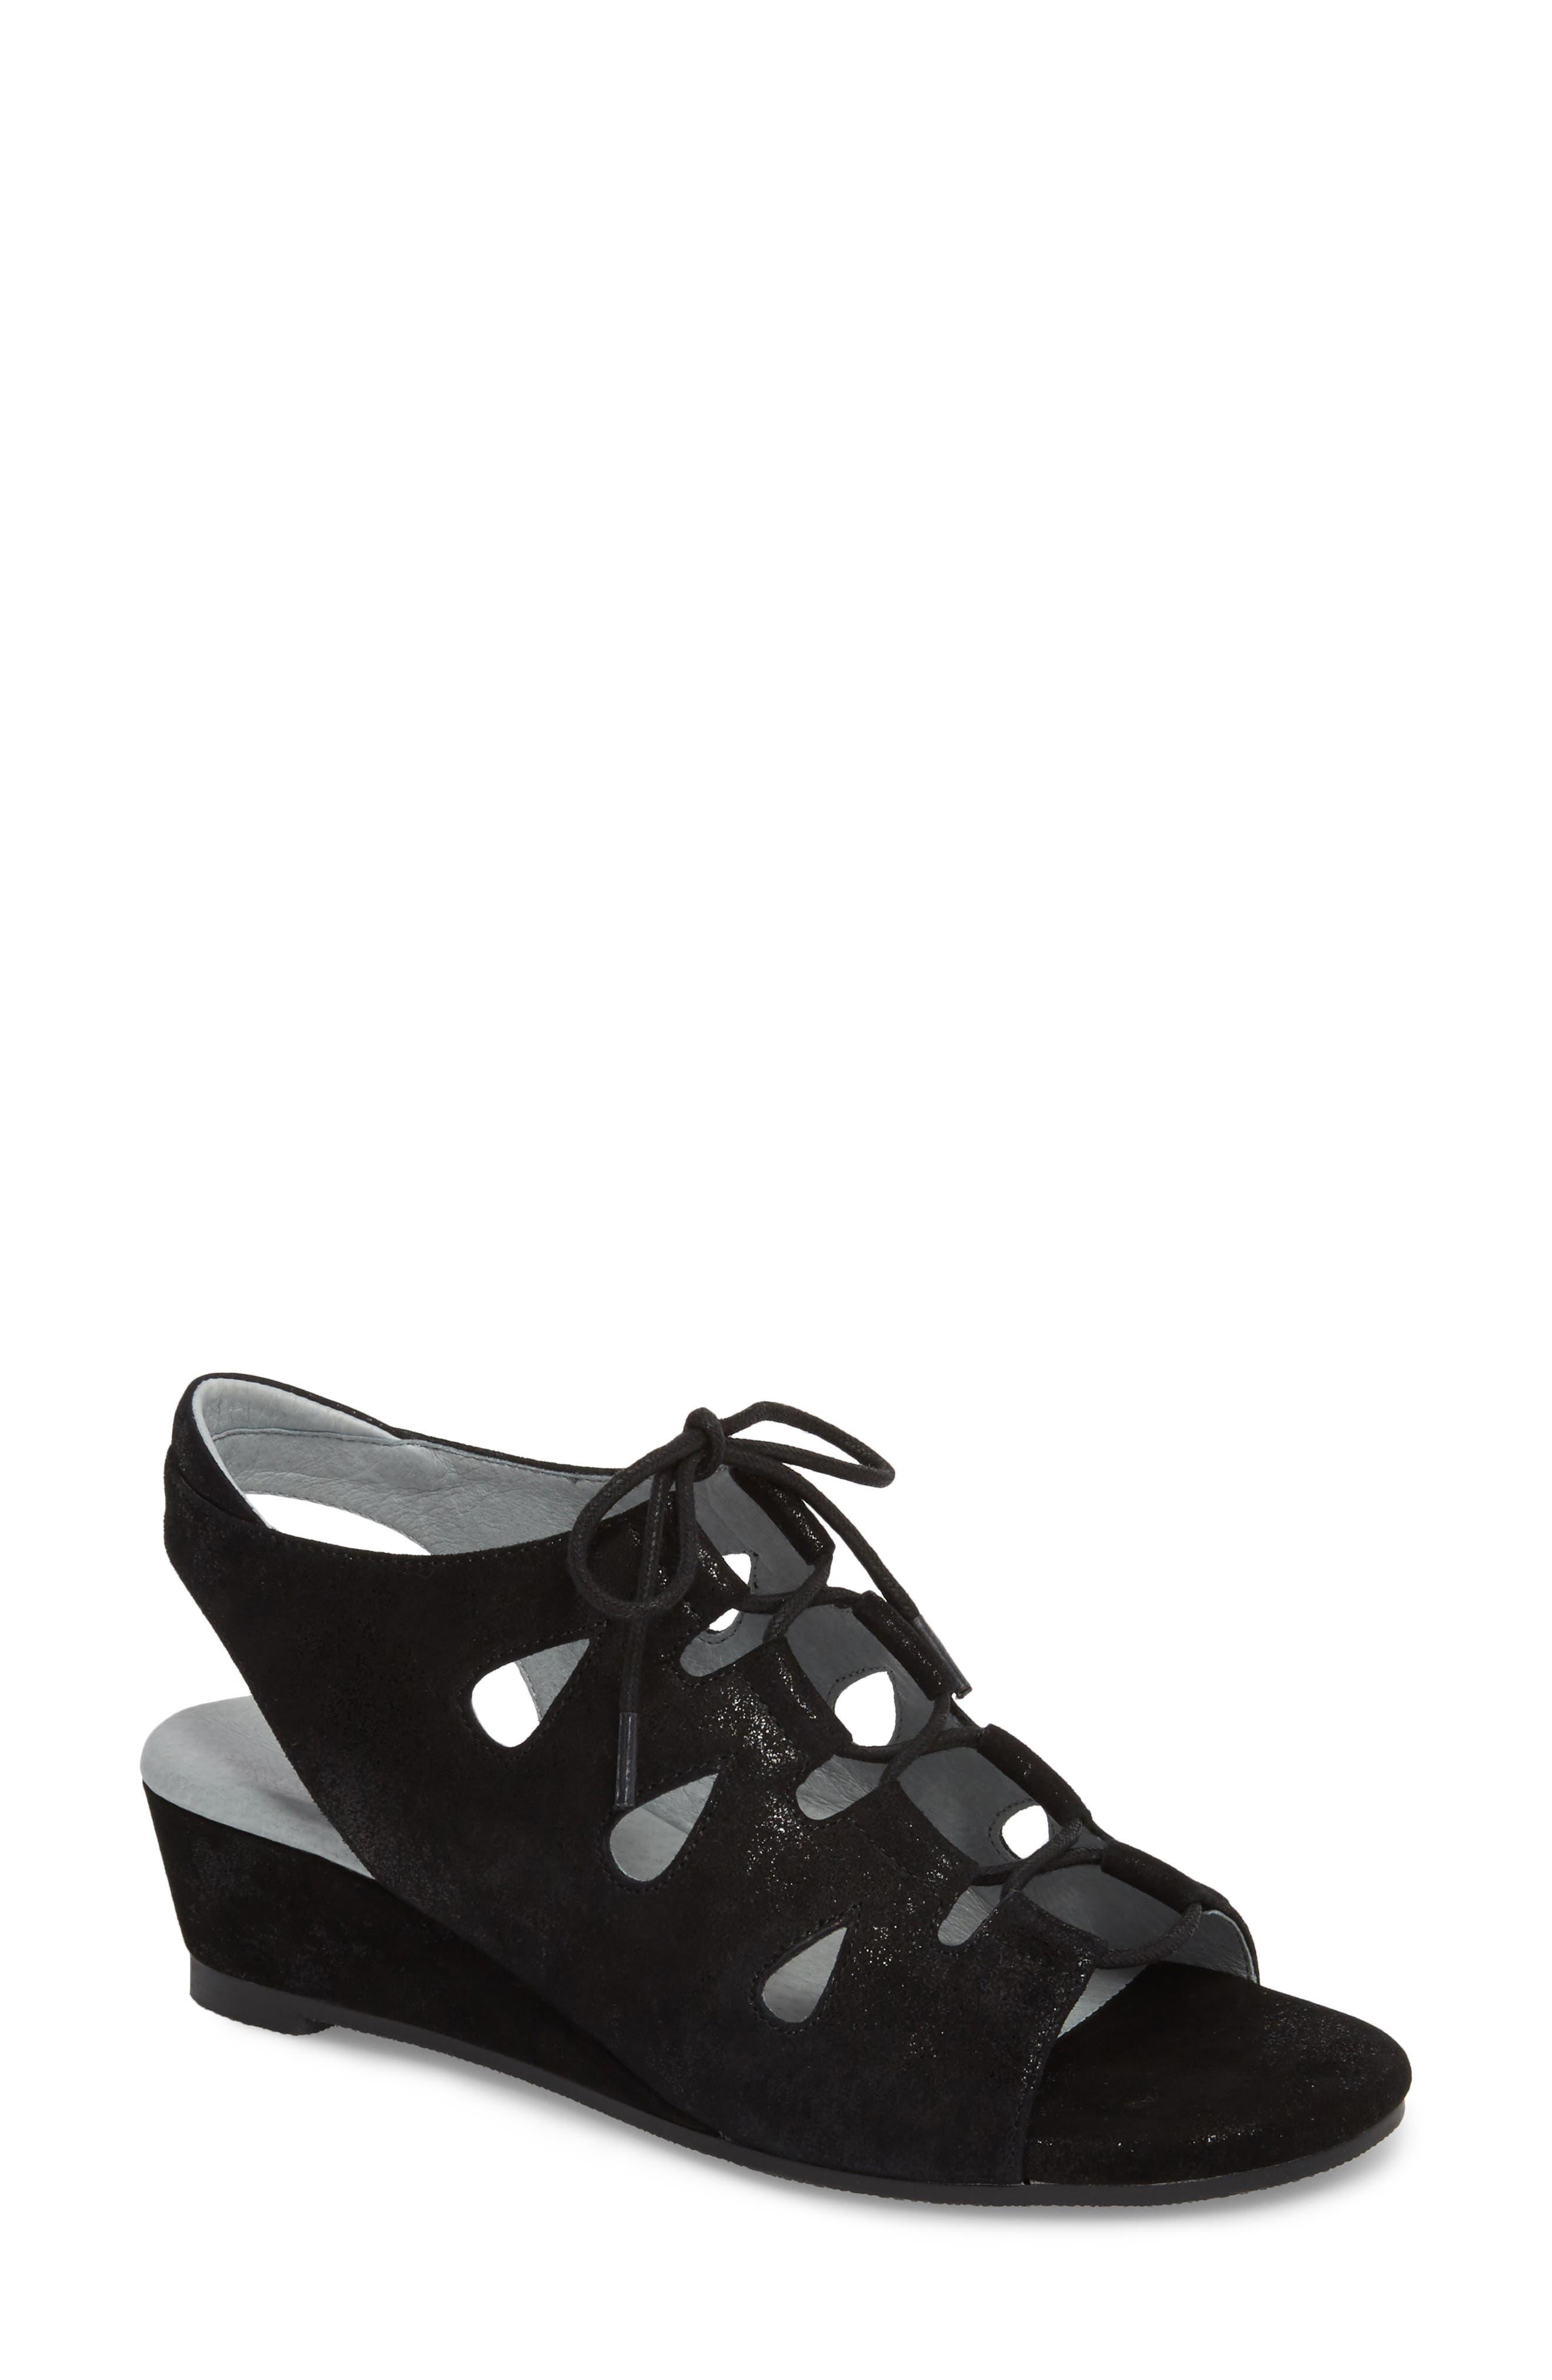 DAVID TATE Rich Wedge Sandal, Main, color, BLACK SUEDE